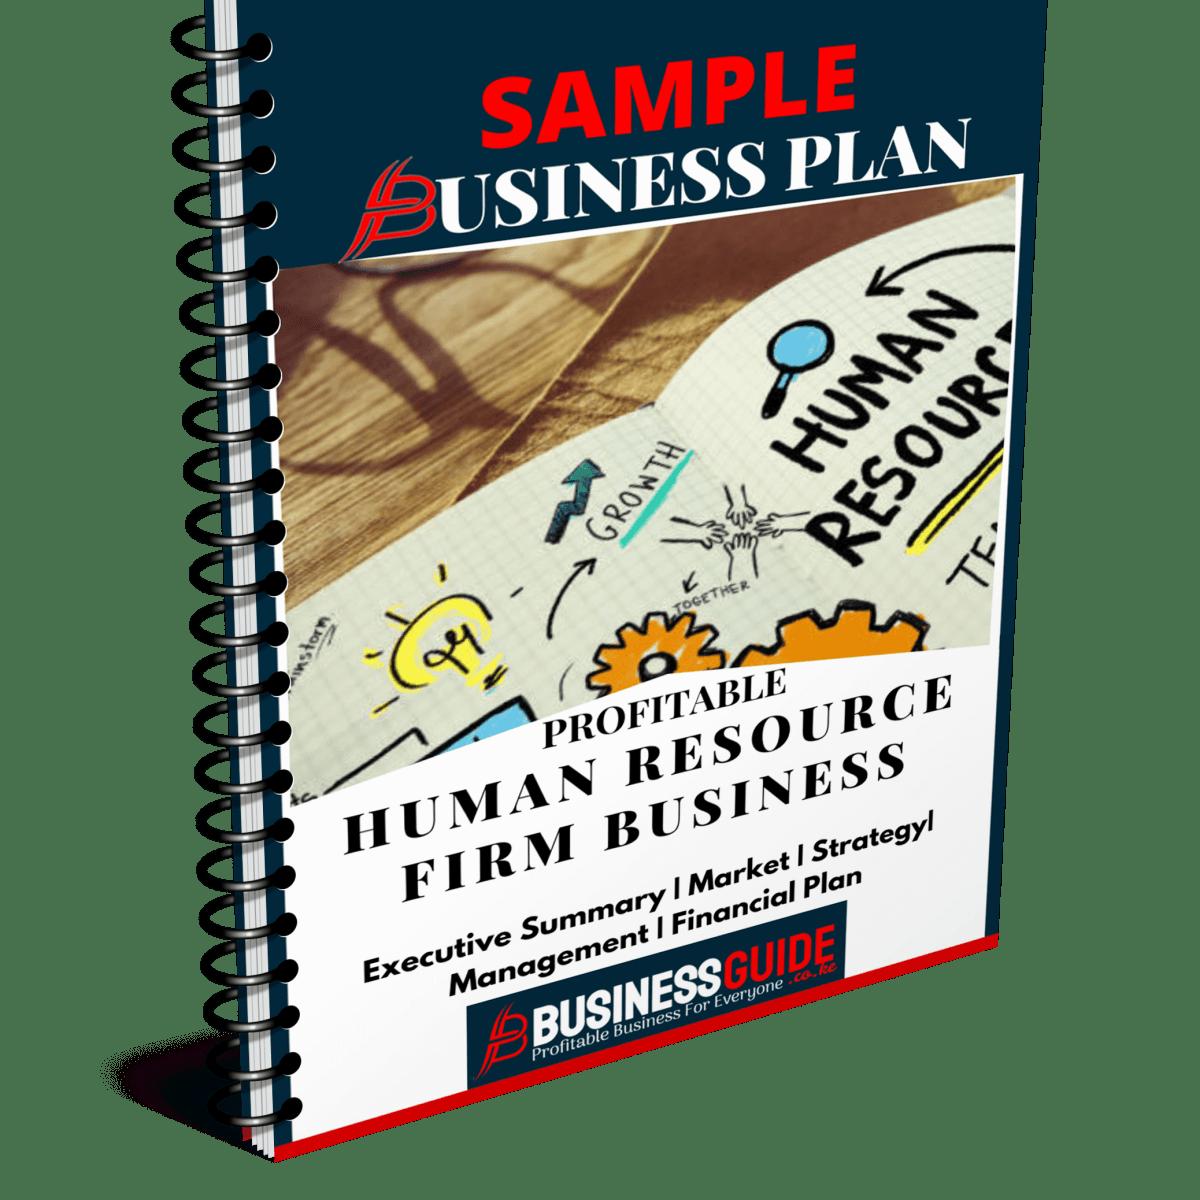 human resource business plan sample